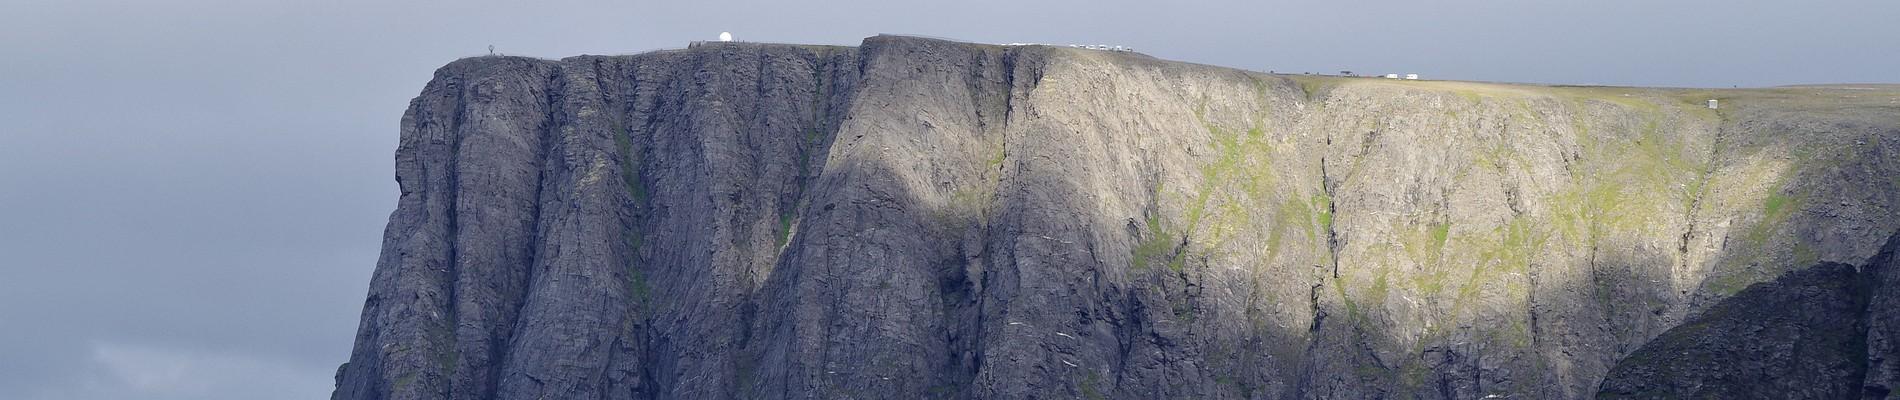 Blick aufs Nordkap-Plateau